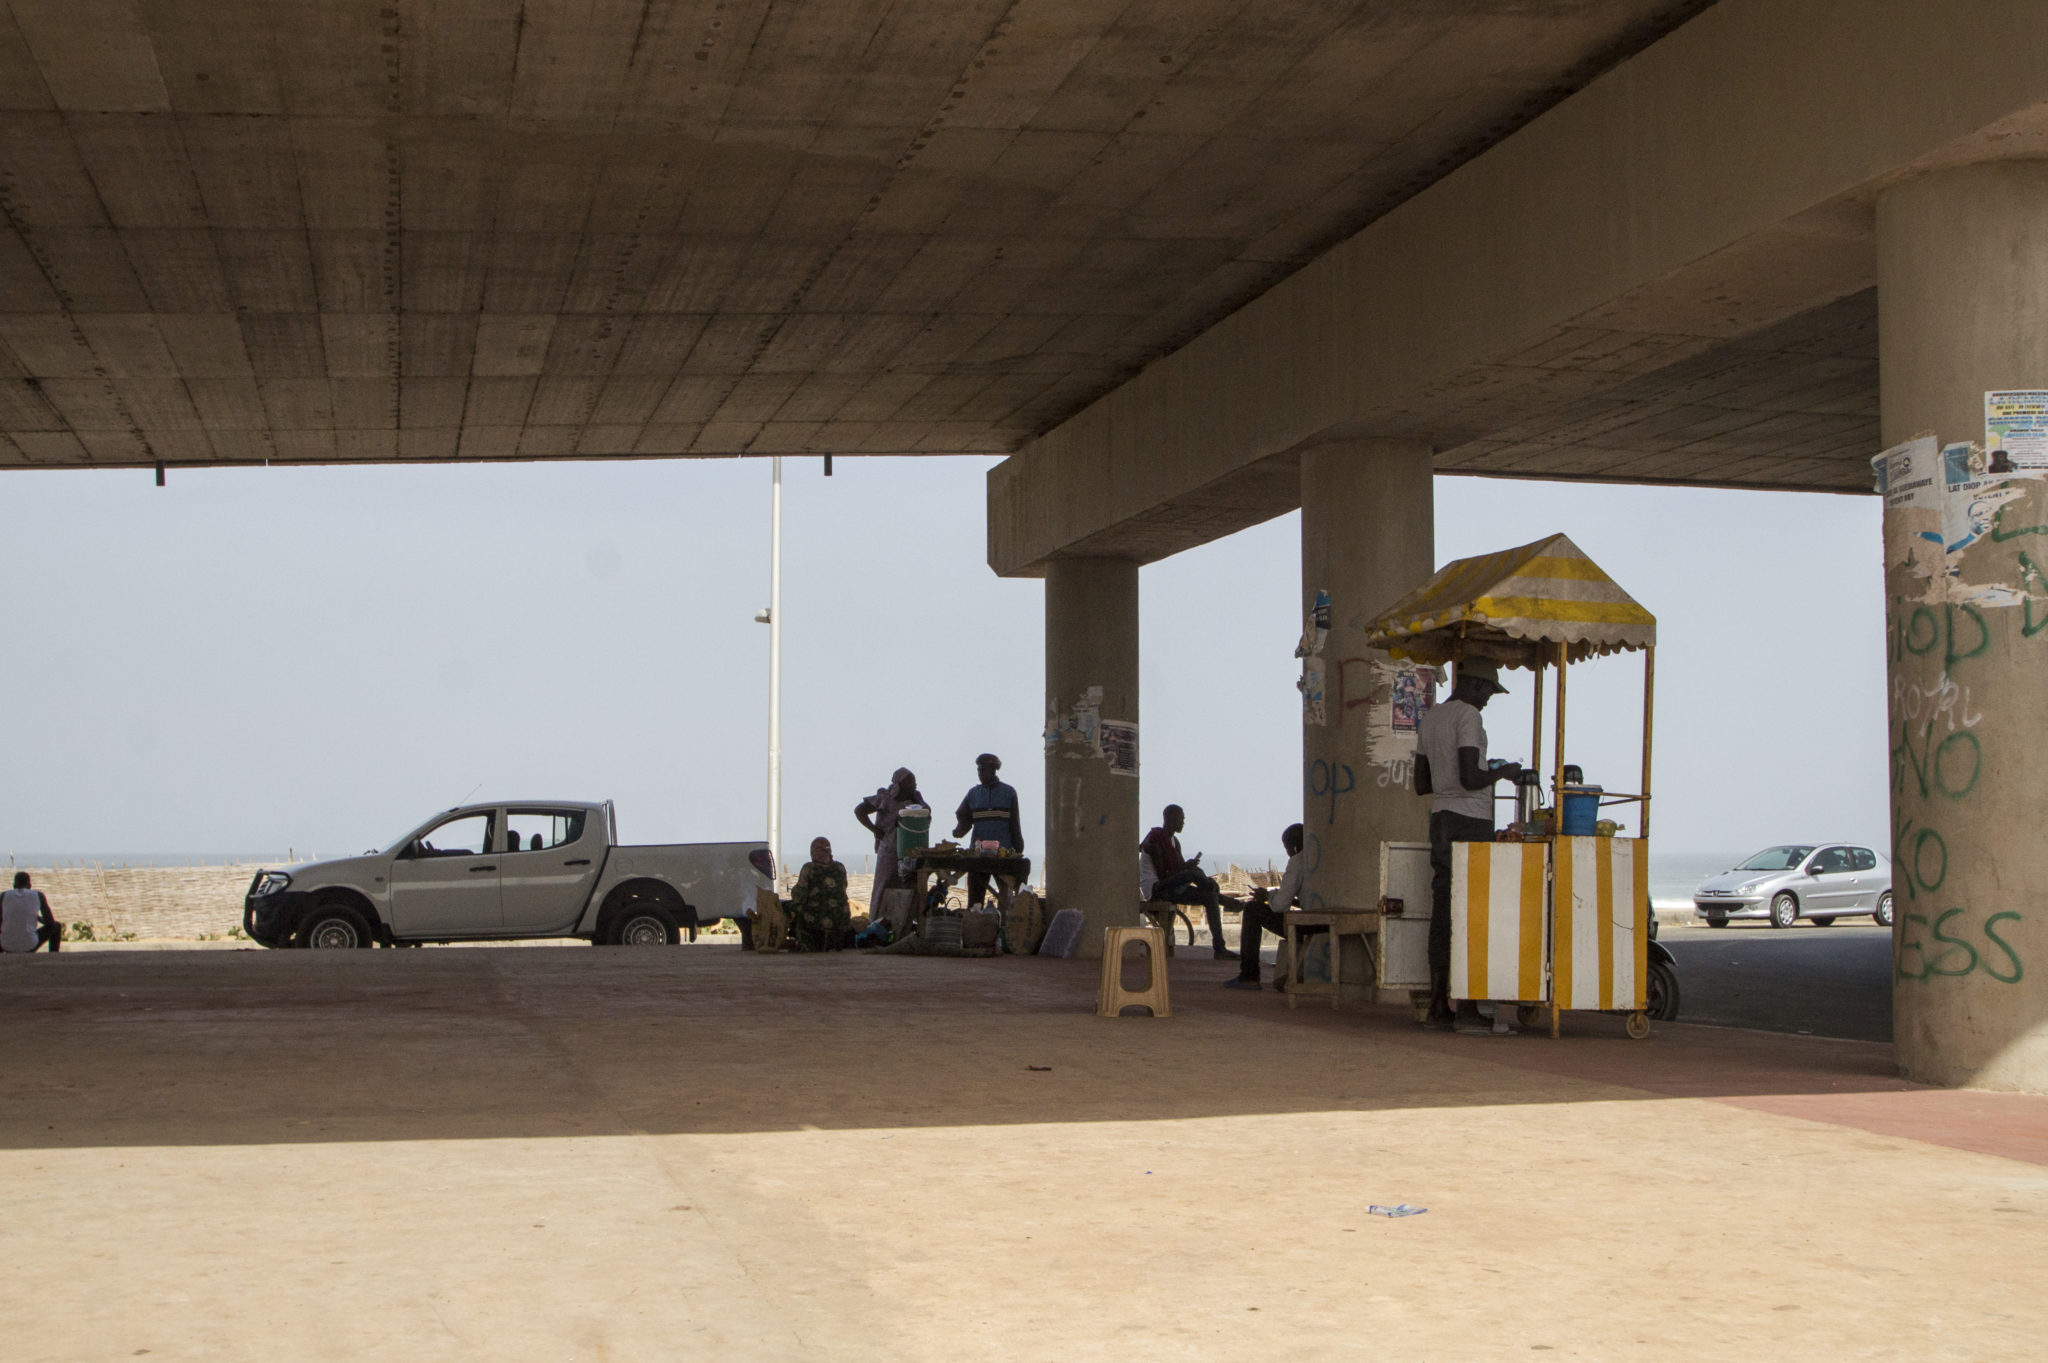 Mbour-Petite-Cote-Senegal-Verkehr